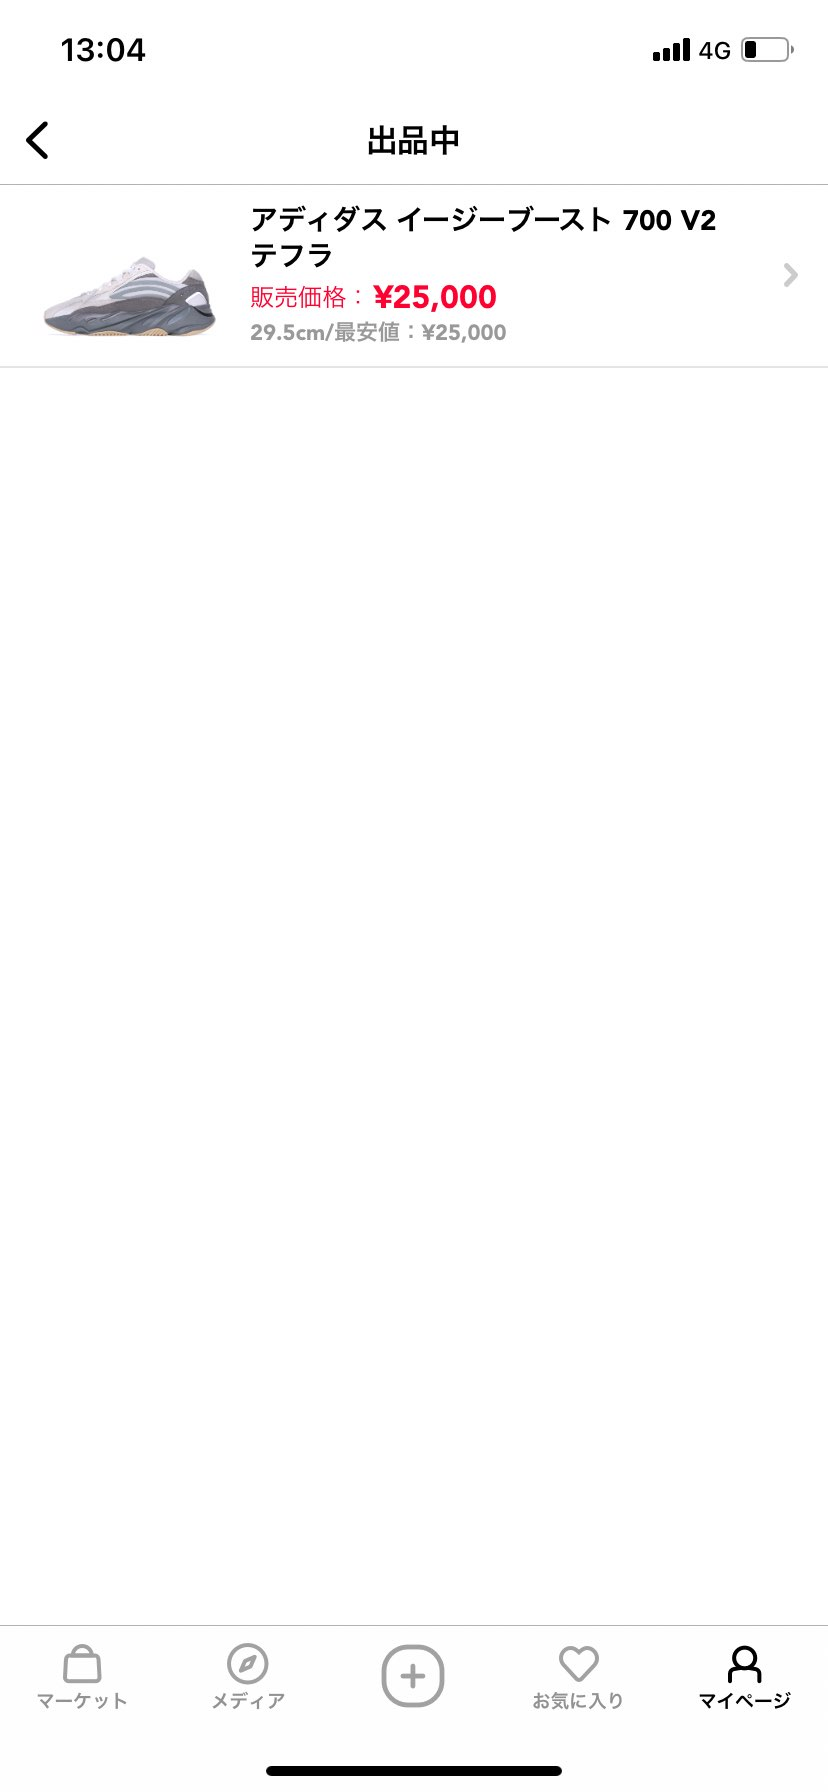 yeezy700 29.5出品してます🙇♂️ よろしくお願いします🙇♂️